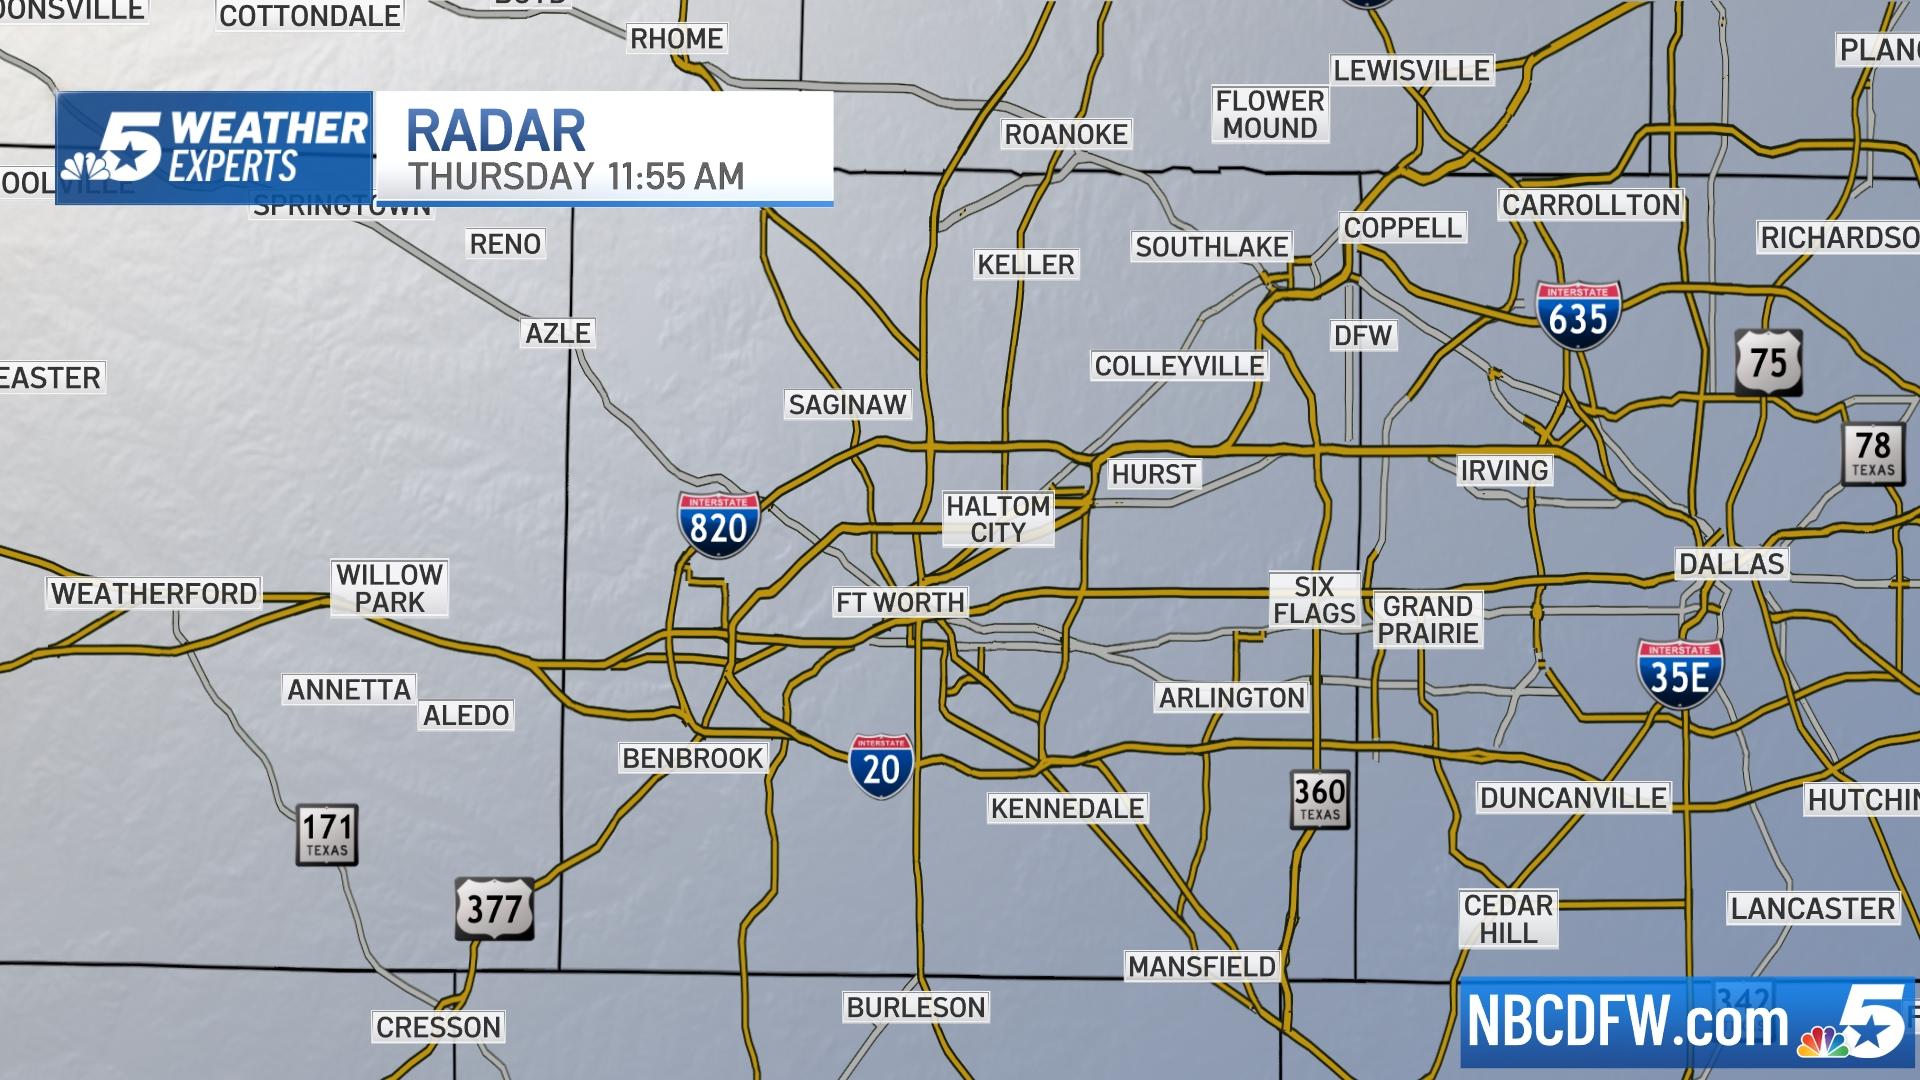 Radar Map Of Texas.Jrndzz5bbh7fim